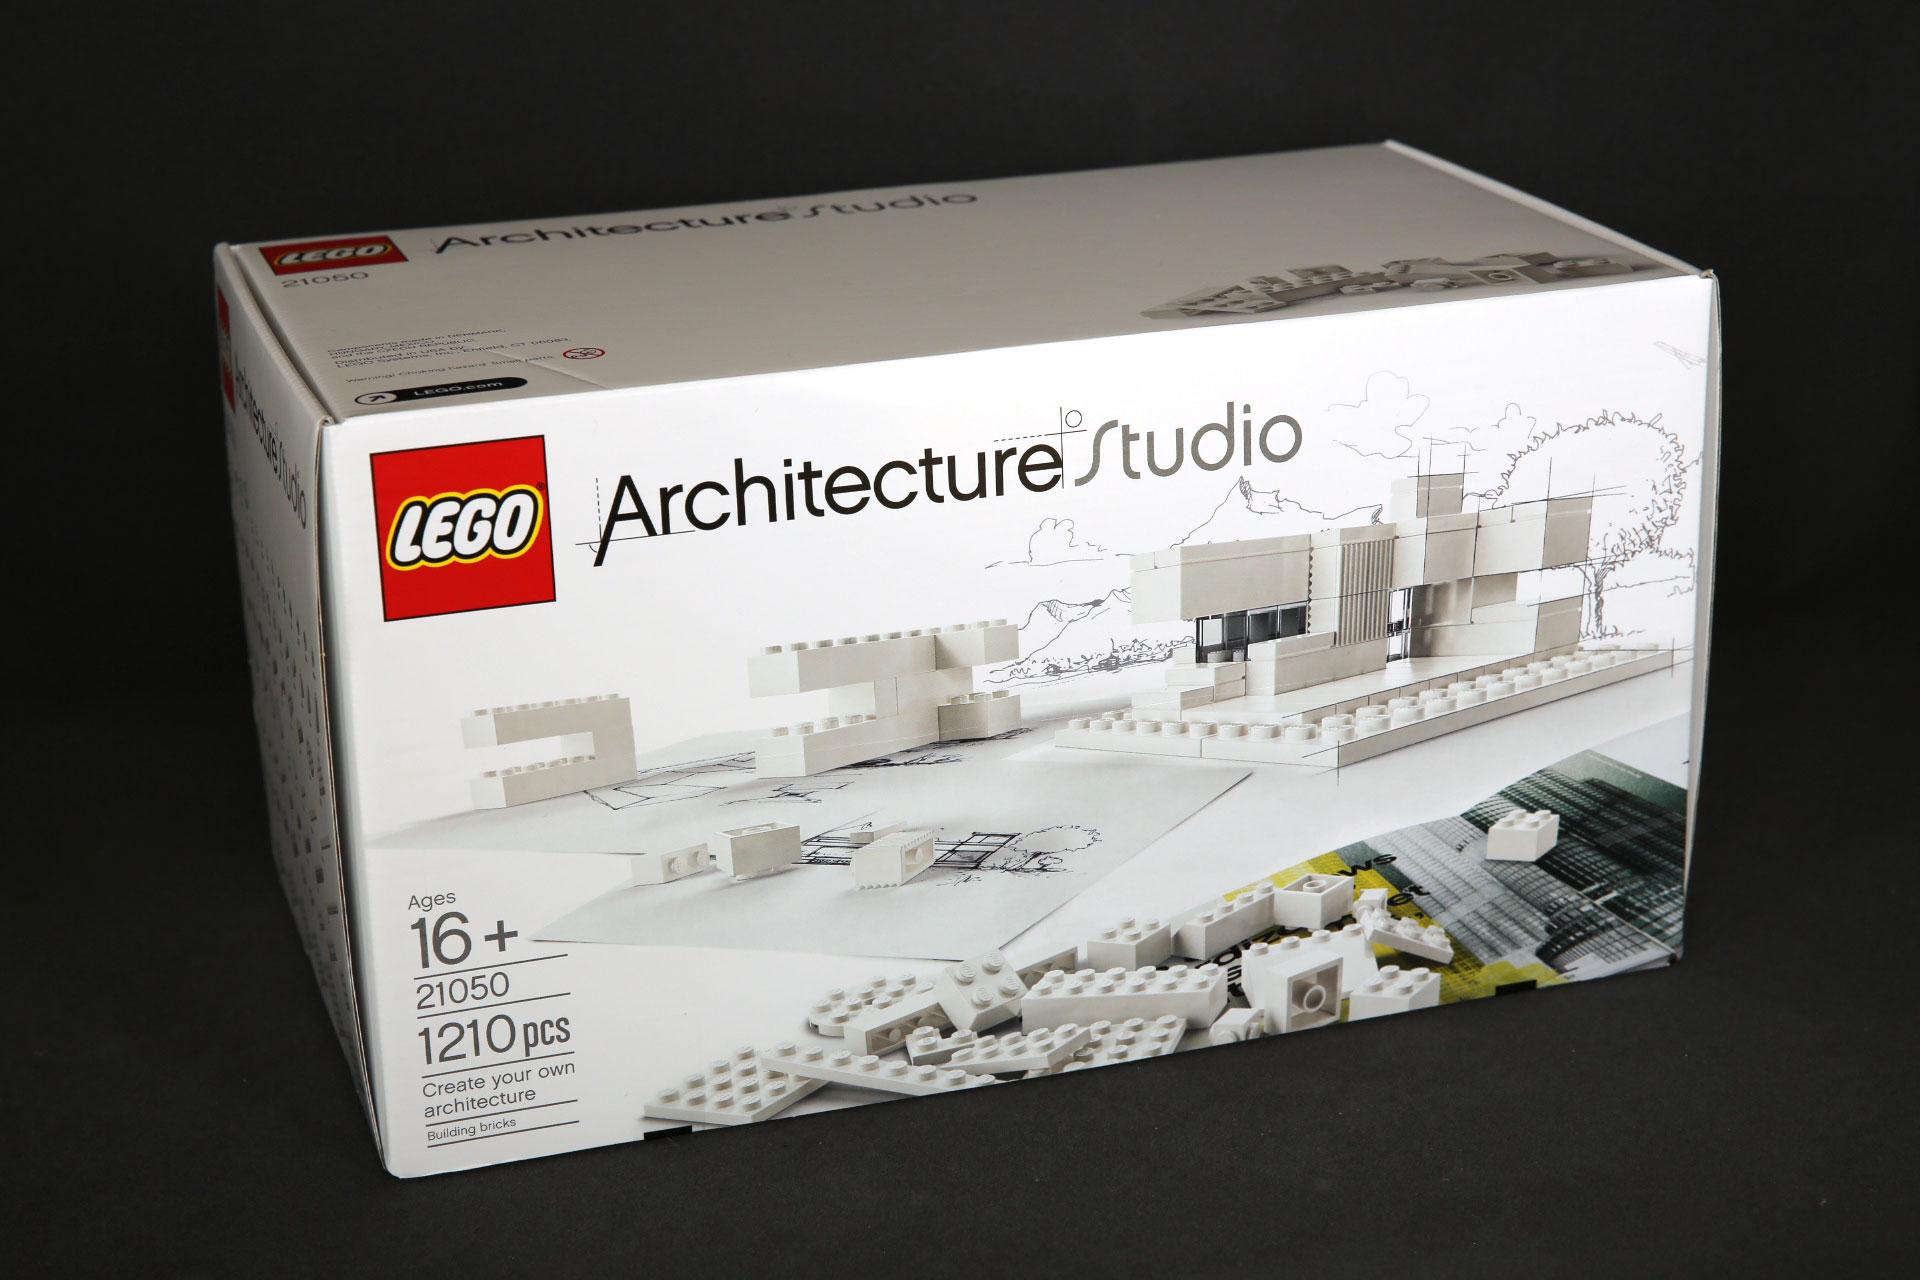 21050 architecture studio set. Black Bedroom Furniture Sets. Home Design Ideas